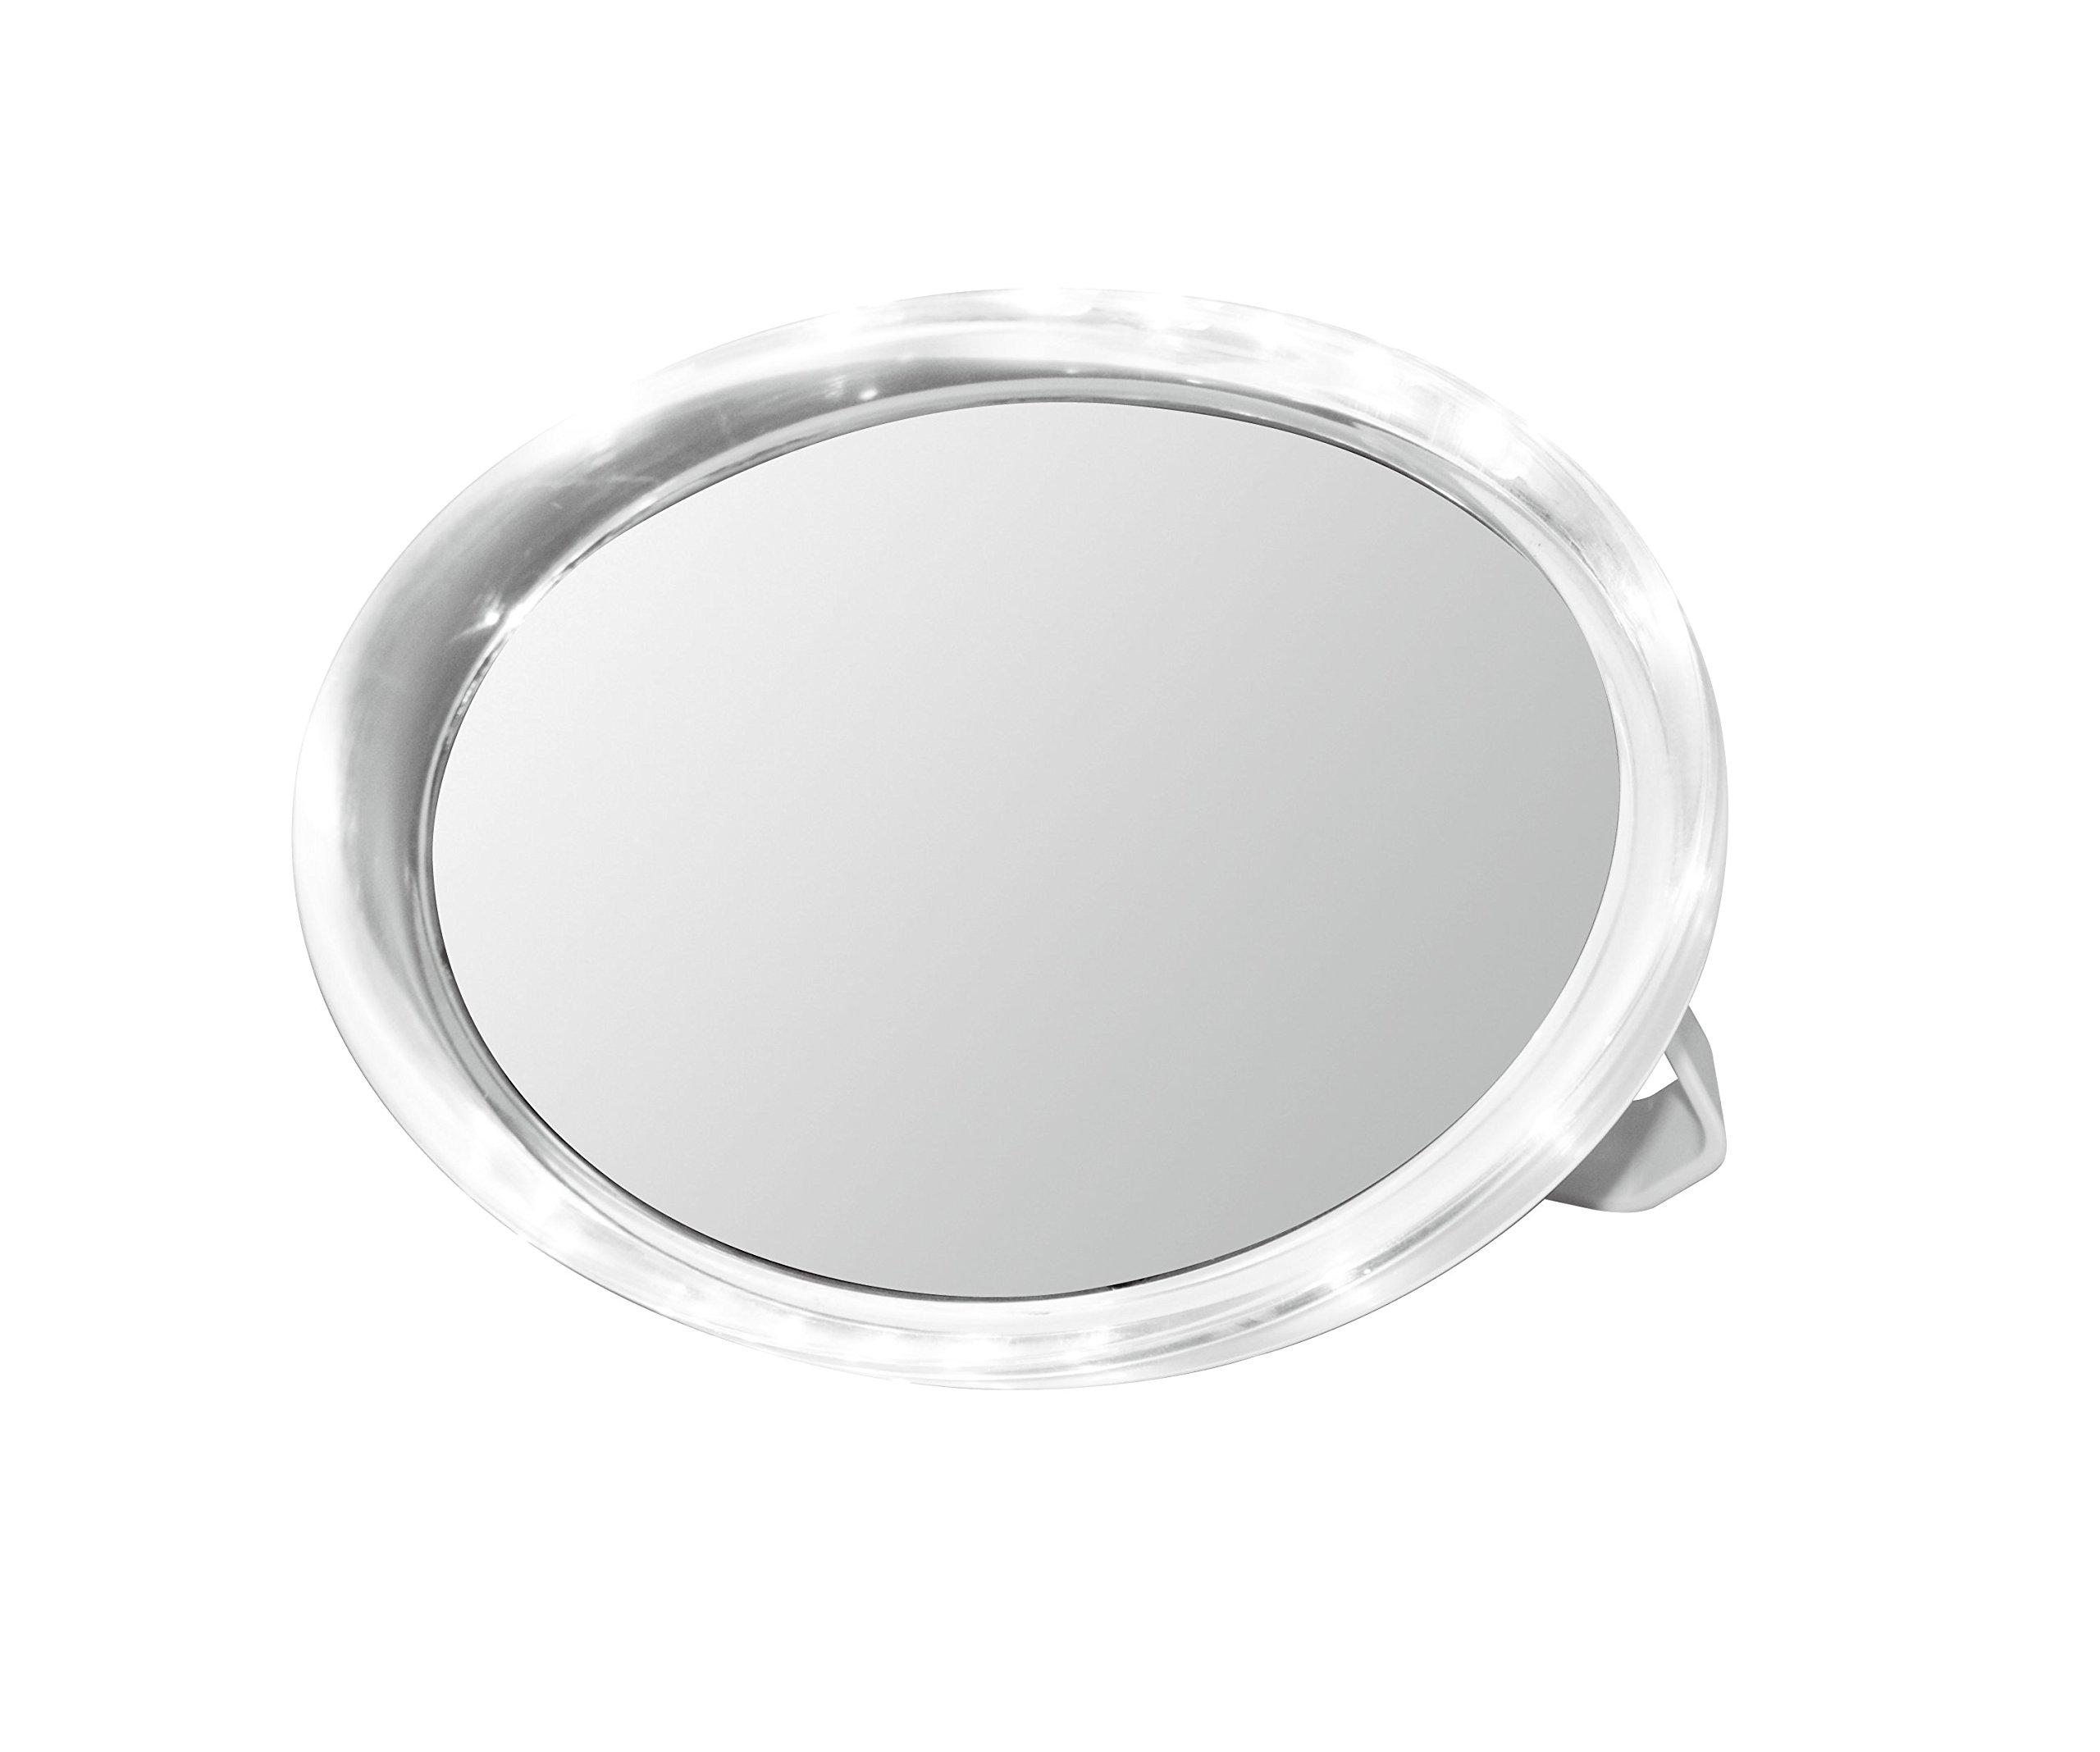 Volere Spa Illuminated Travel Mirror 5x Magnification